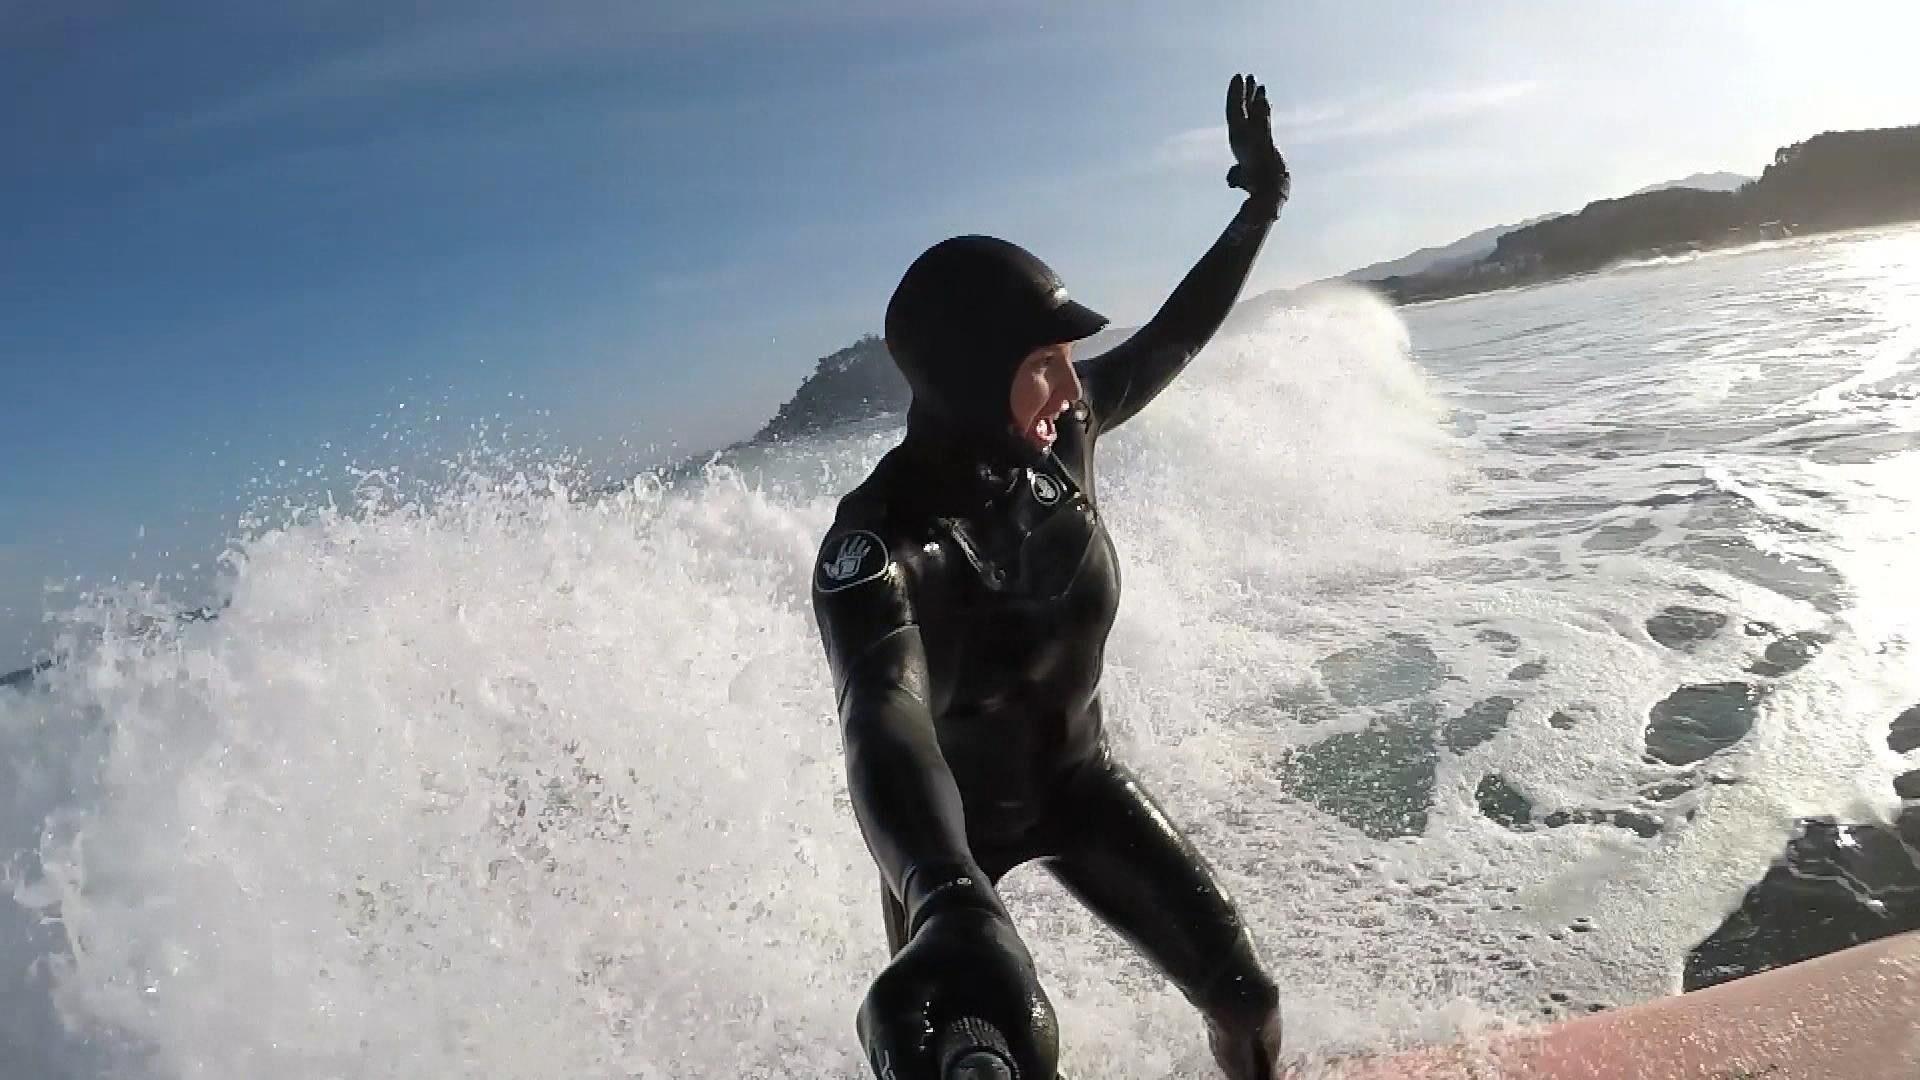 mancuso surfs_637225